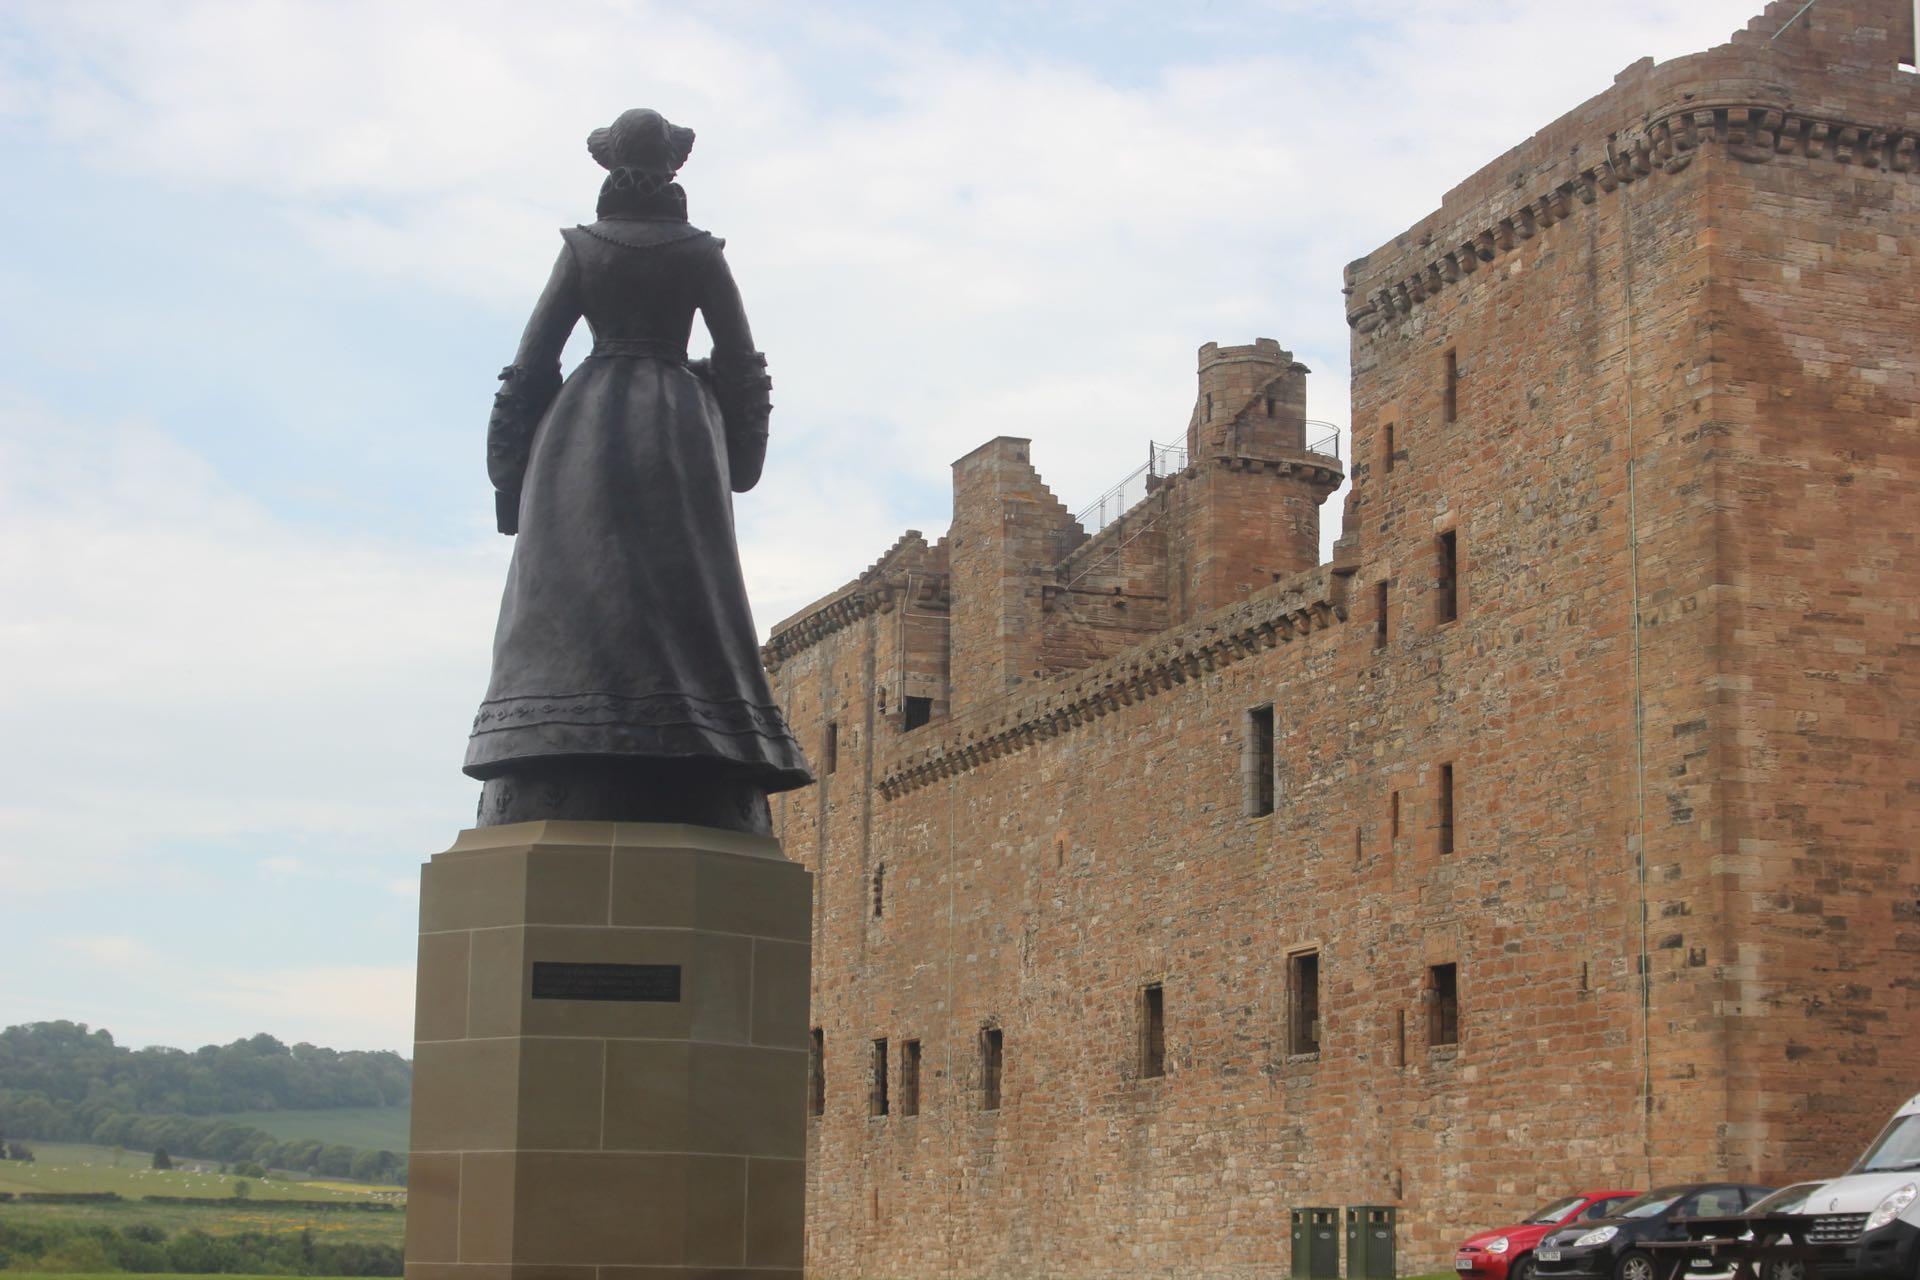 Kuningatar Maria Stuartin patsas Linlithgow'n palatsin luona. Kuva: ©John Lord, Flickr.com CC BY 2.0